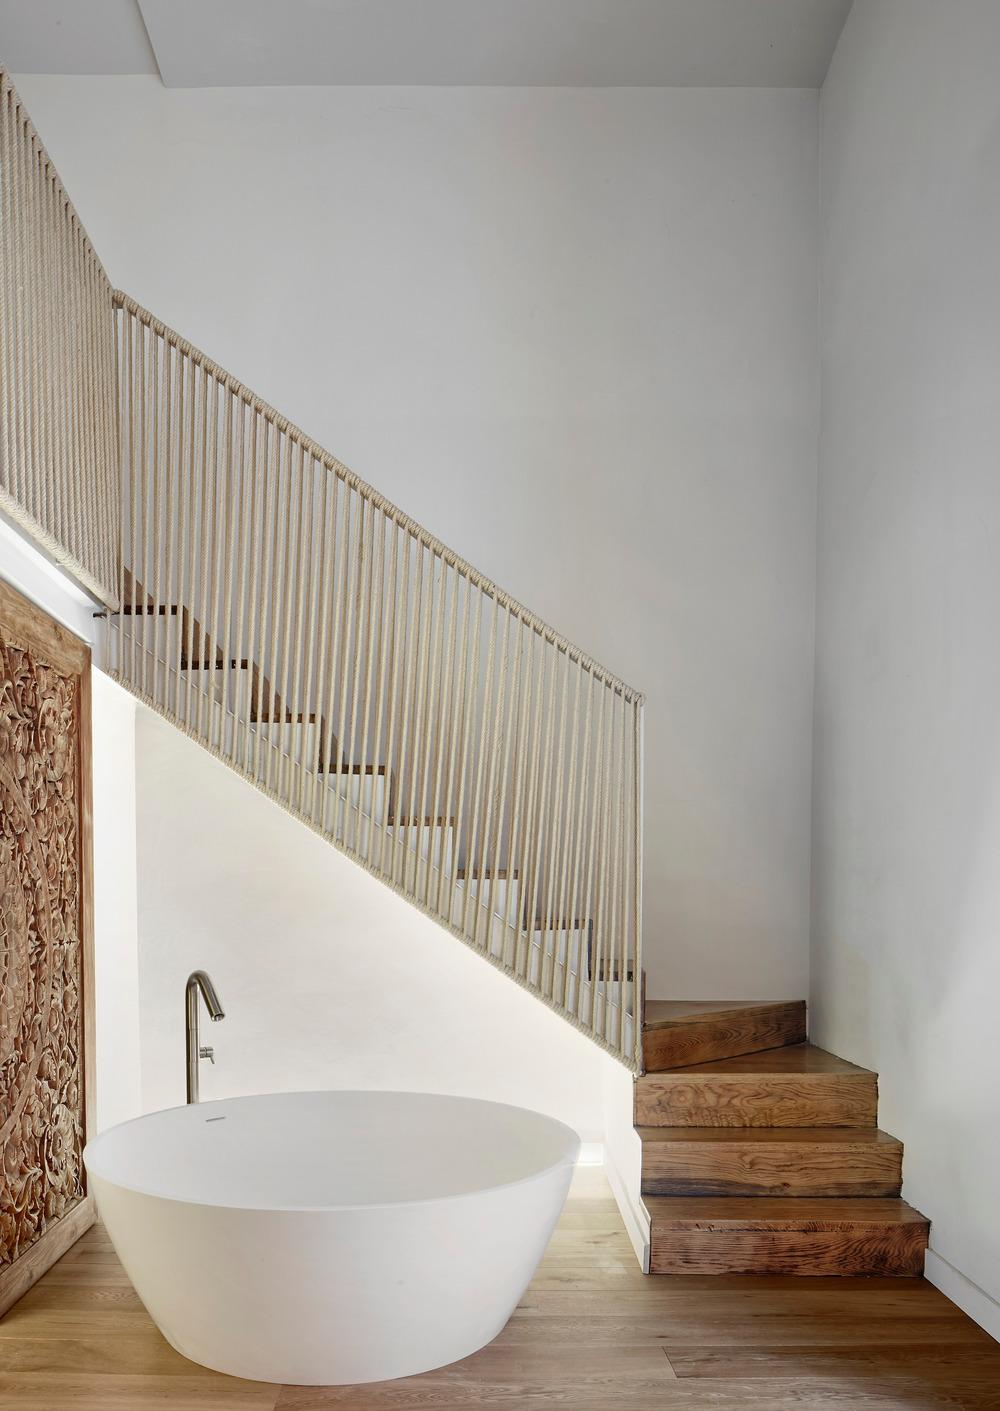 Interior-inspiration-The-Puro-Hotel-in-Palma-5.jpg